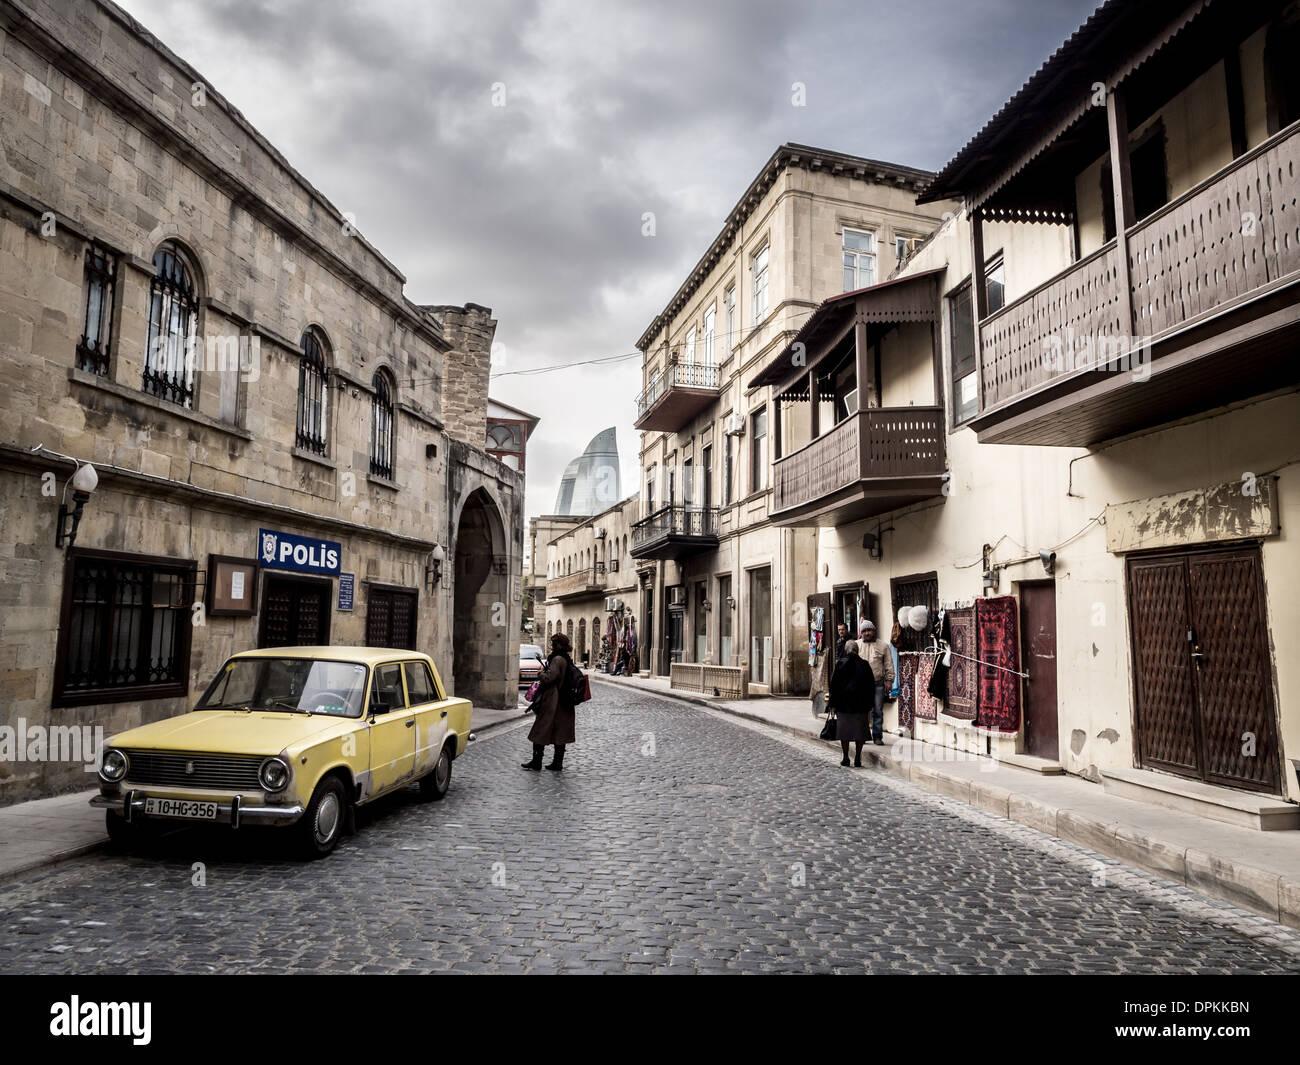 The Old Town (Icheri Sheher) Old Town of Baku, Azerbaijan - Stock Image